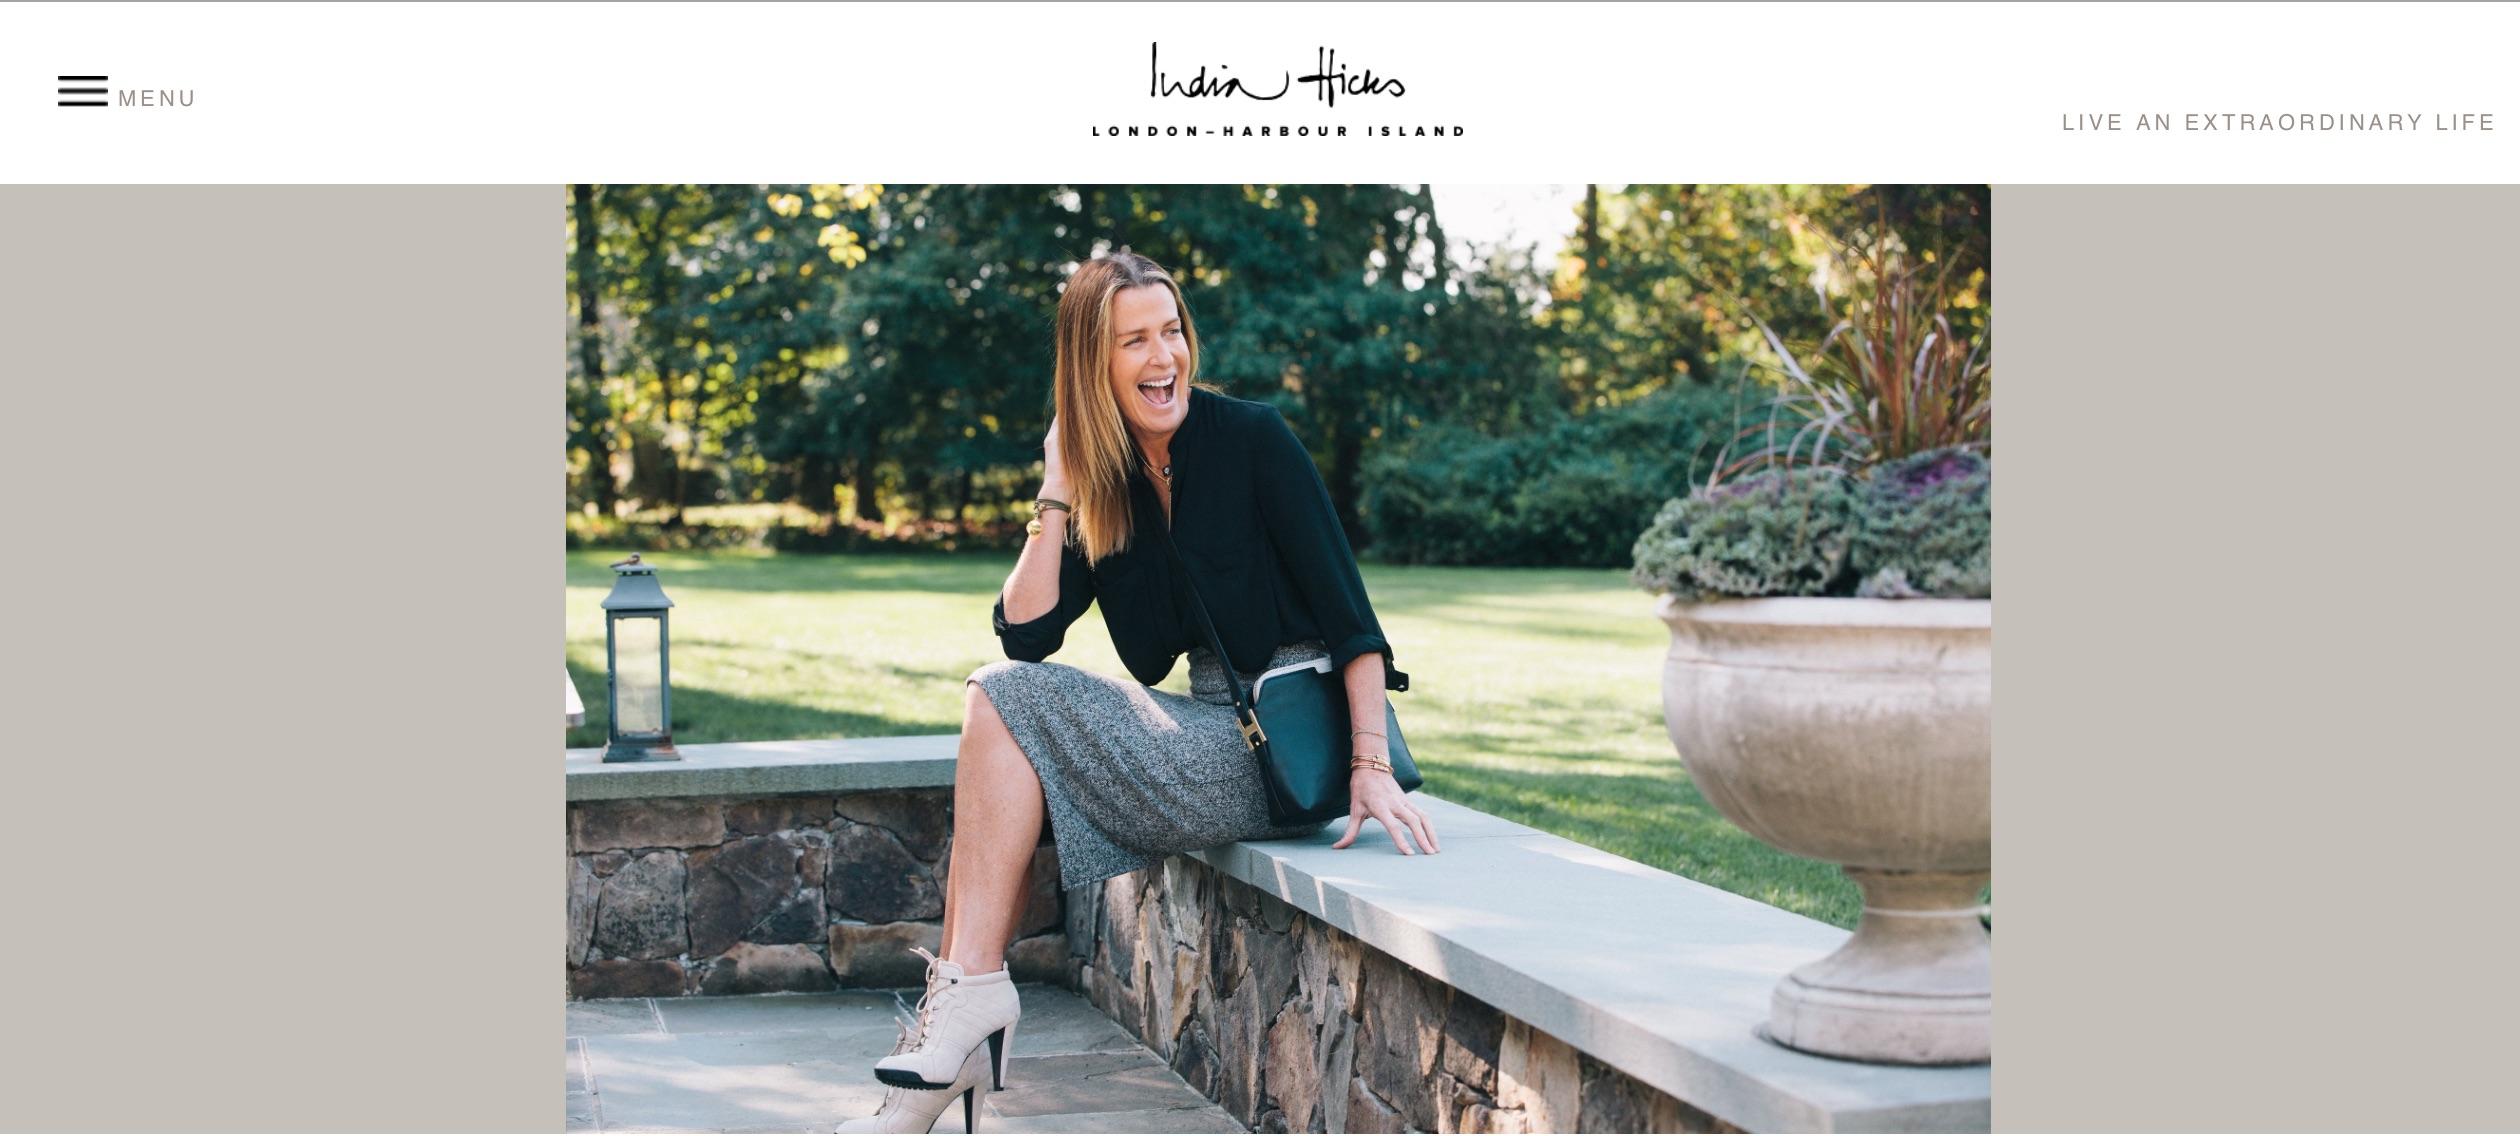 India Hicks e-comm homepage